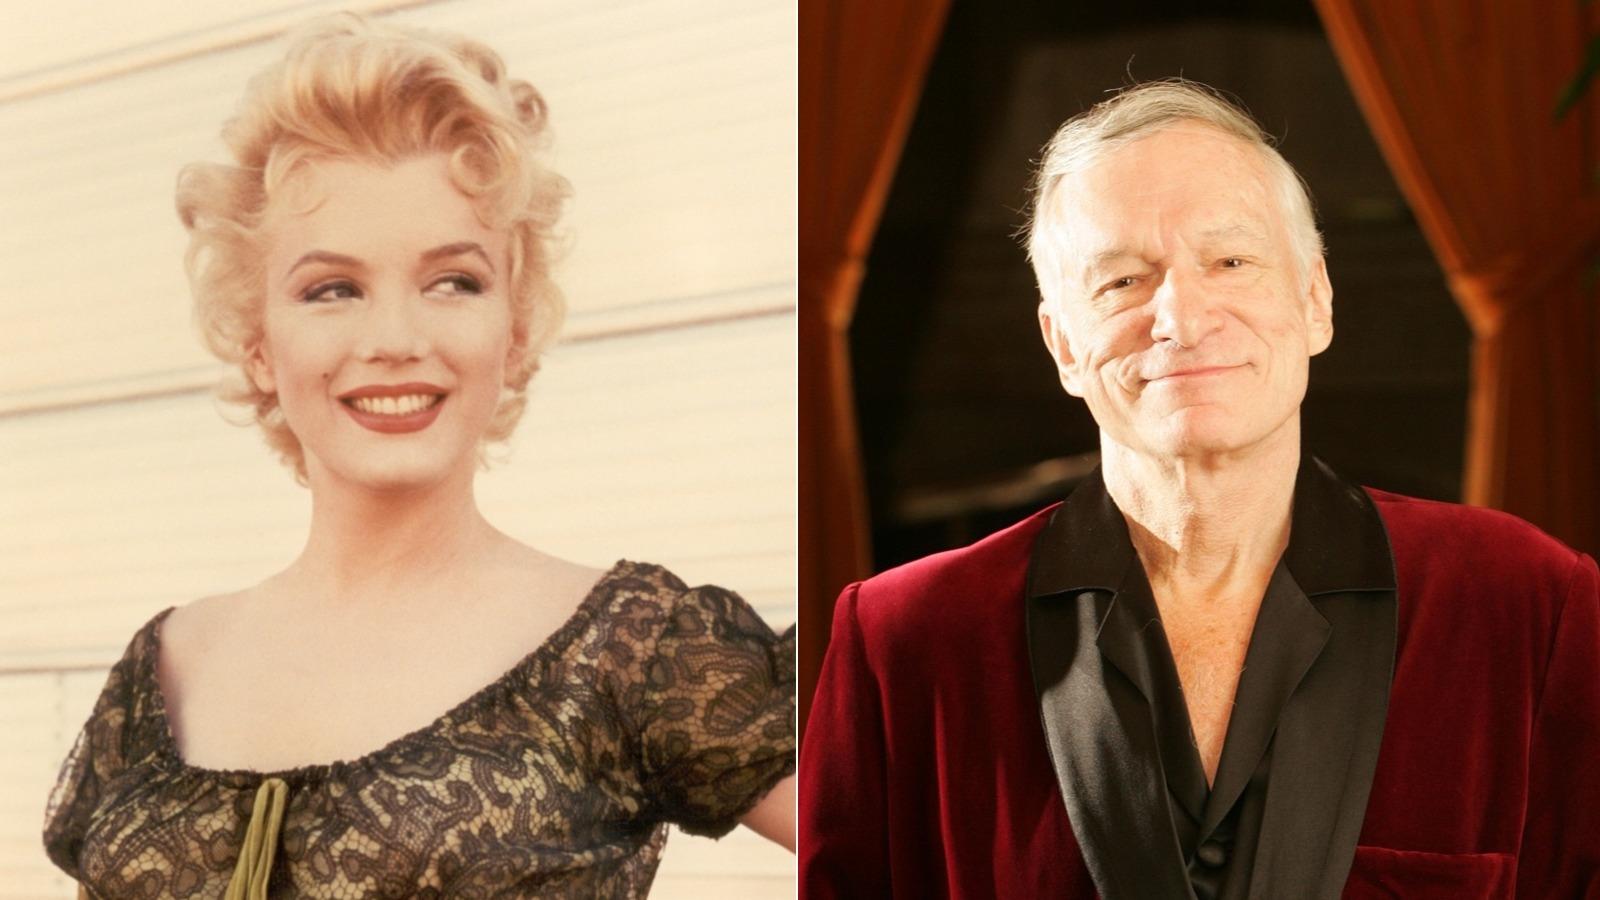 How Hugh Hefner ripped off Marilyn Monroe